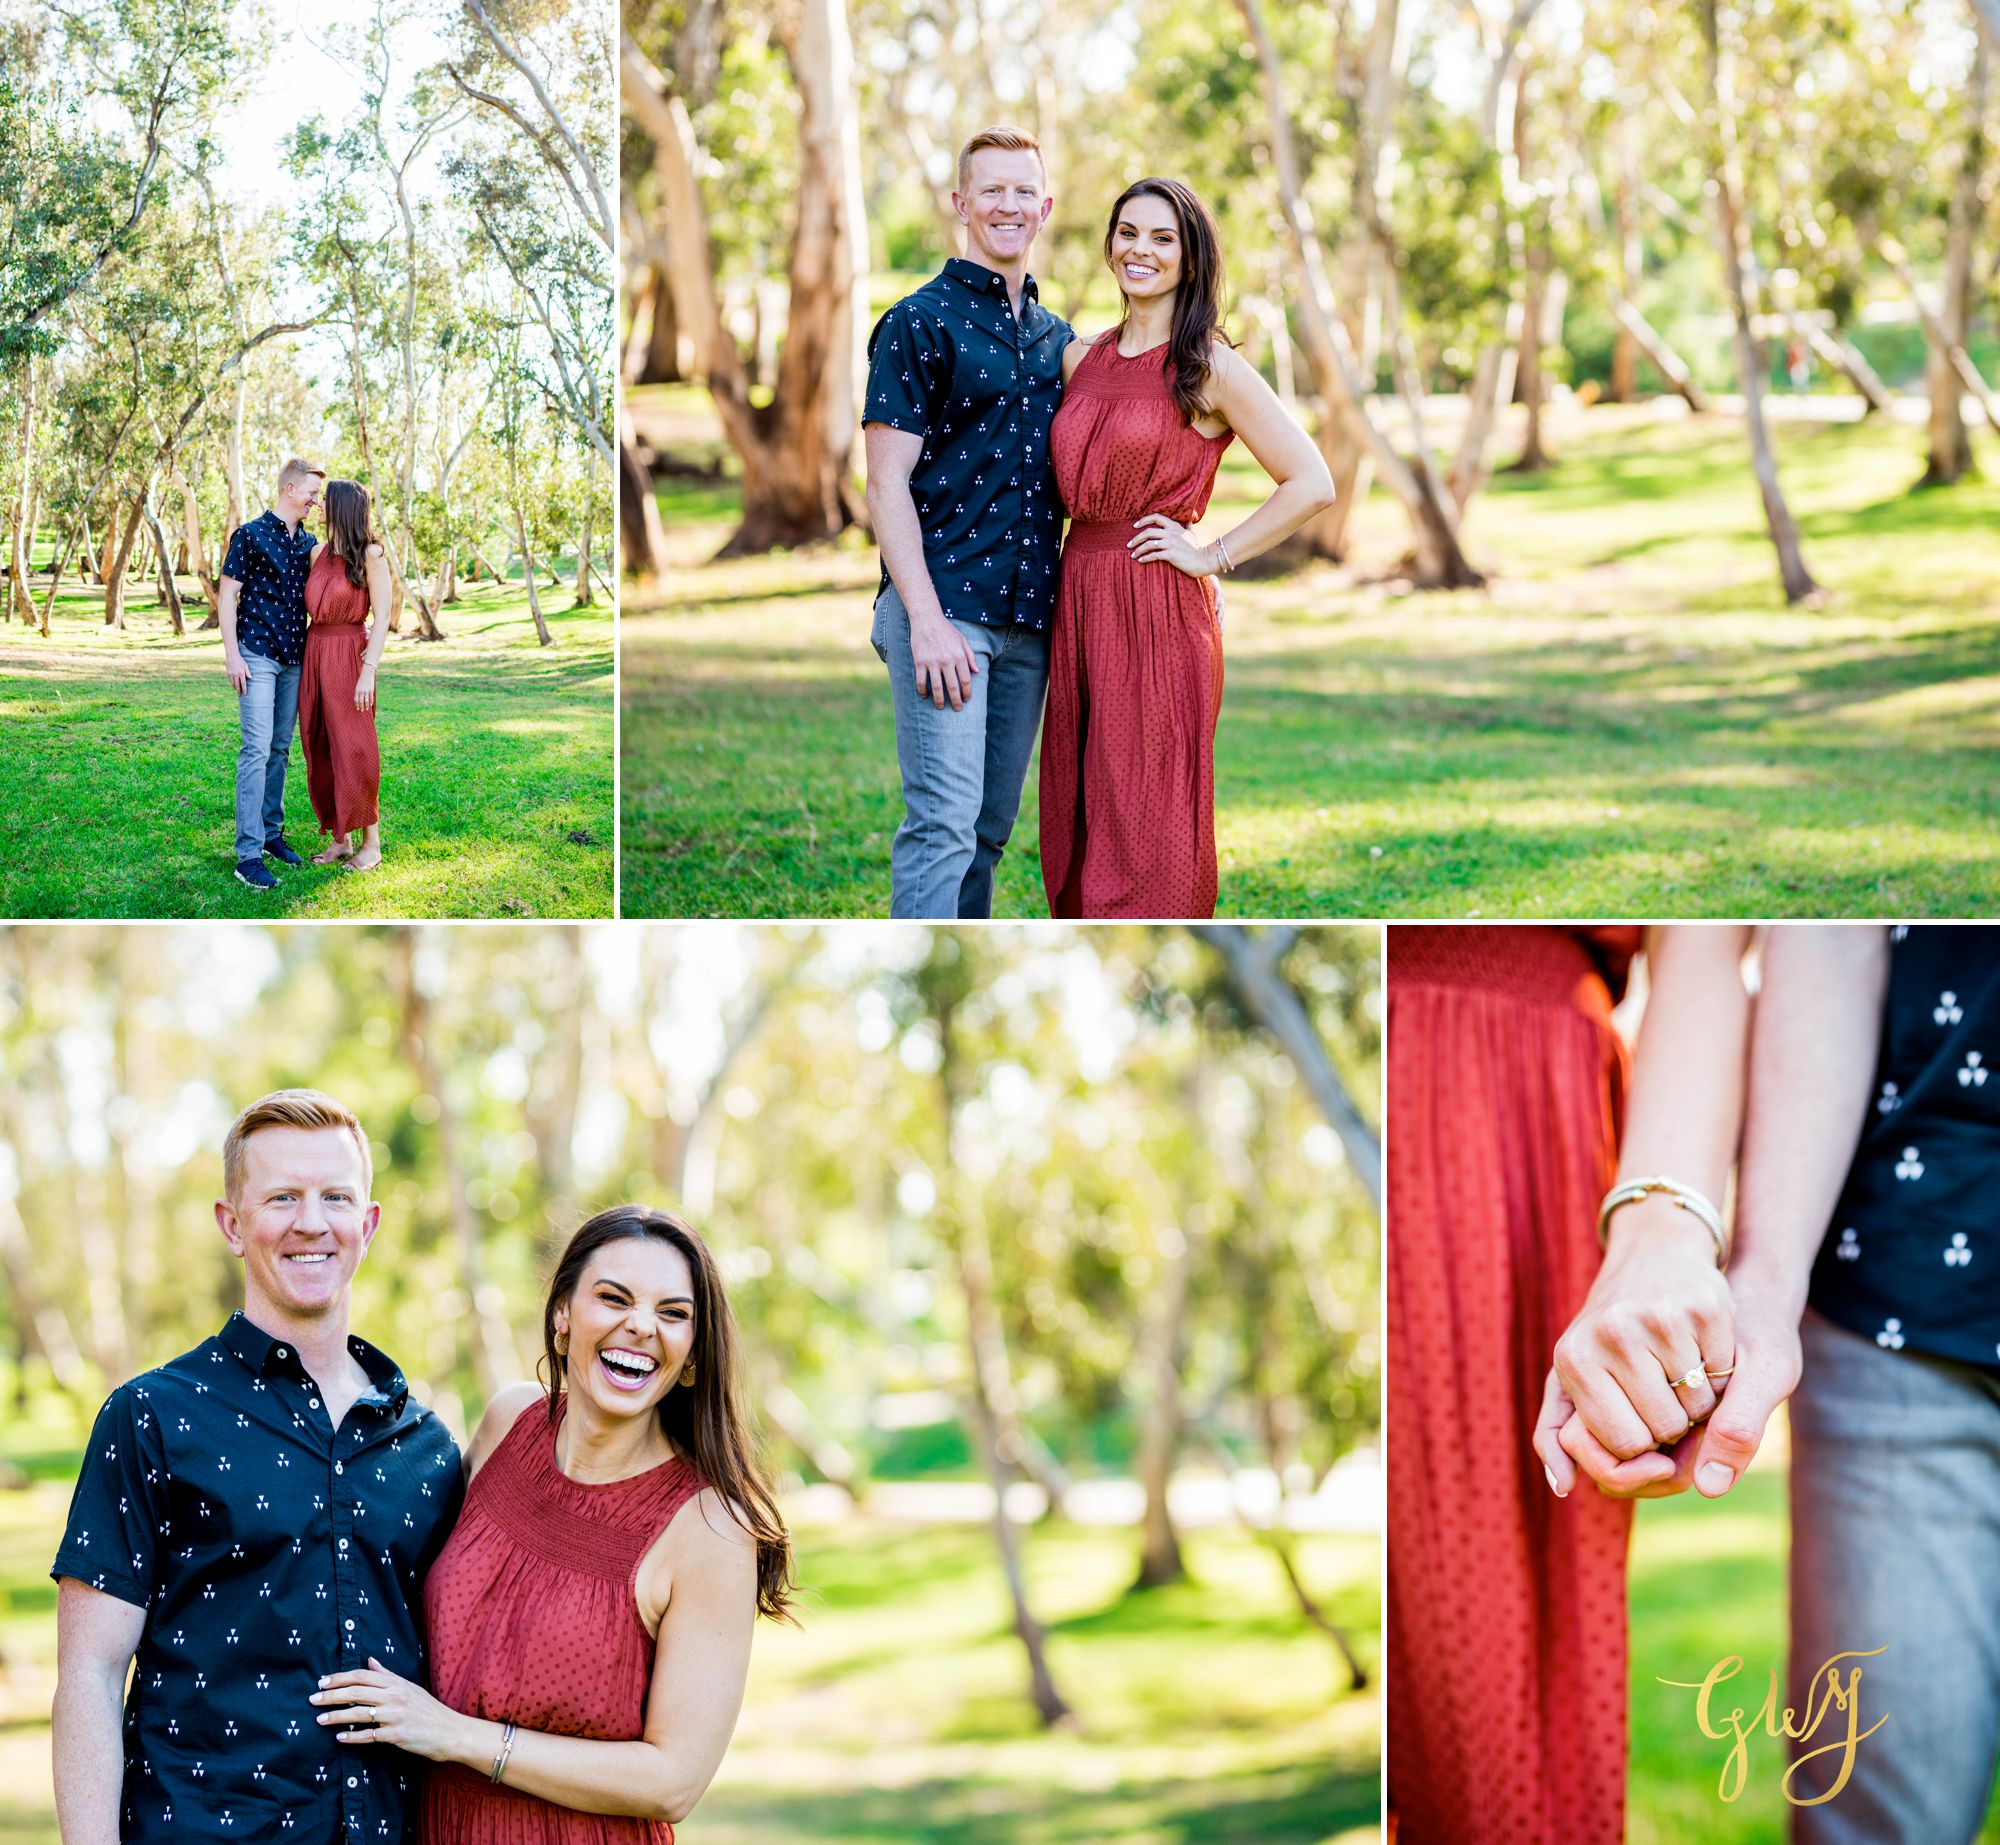 2019.05.27 - Ryley + Tolalf Romantic Summer Huntington Beach + HB Central Park Engagement Session by Glass Woods Media 1.jpg